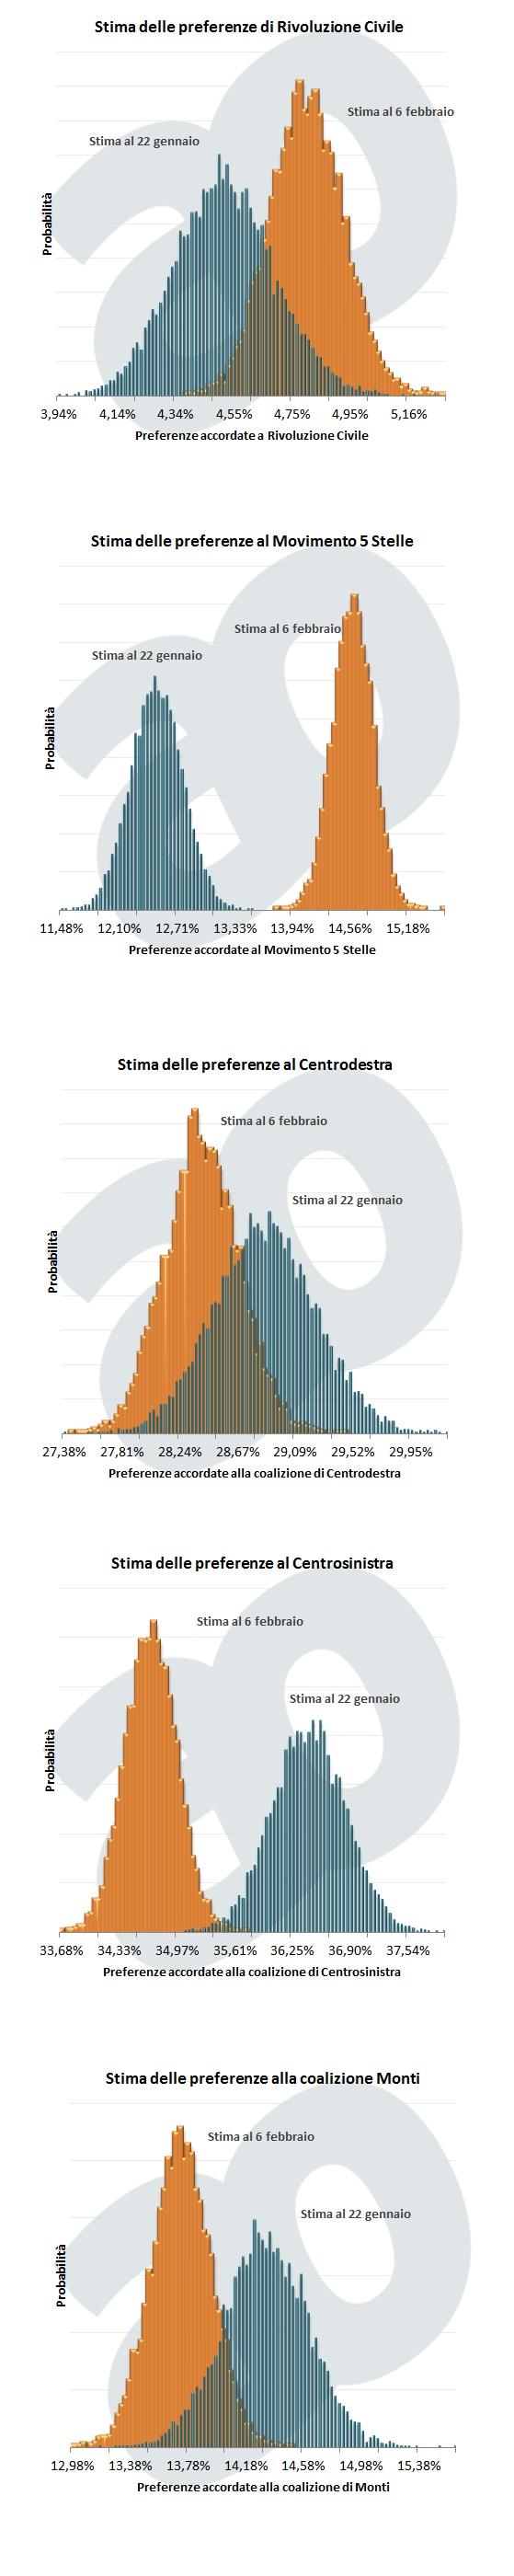 sondaggi elettorali 2013